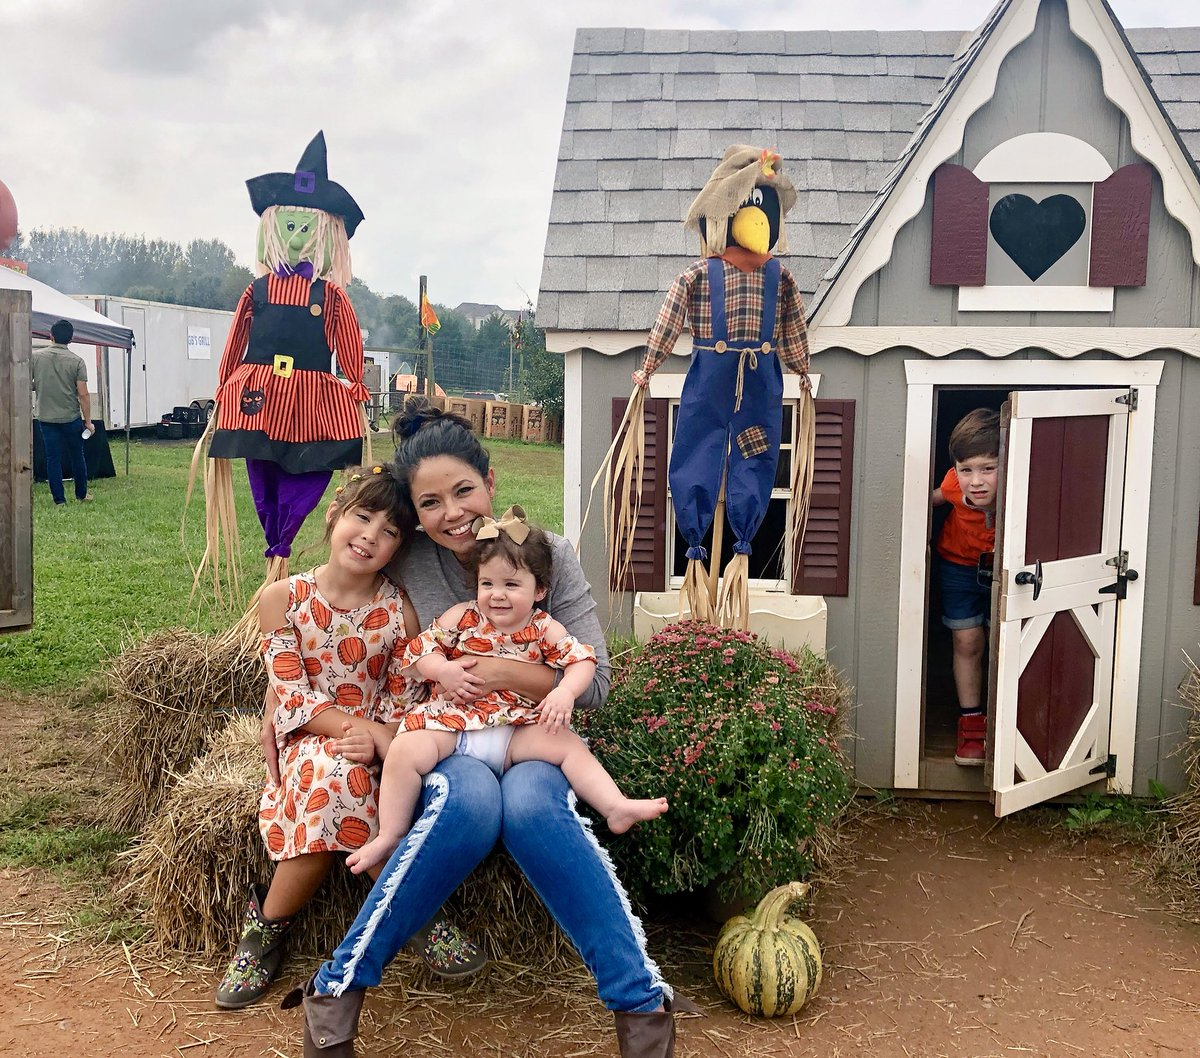 🧡my pumpkins🧡 #leesburgva #pumpkinpatch #fallfun